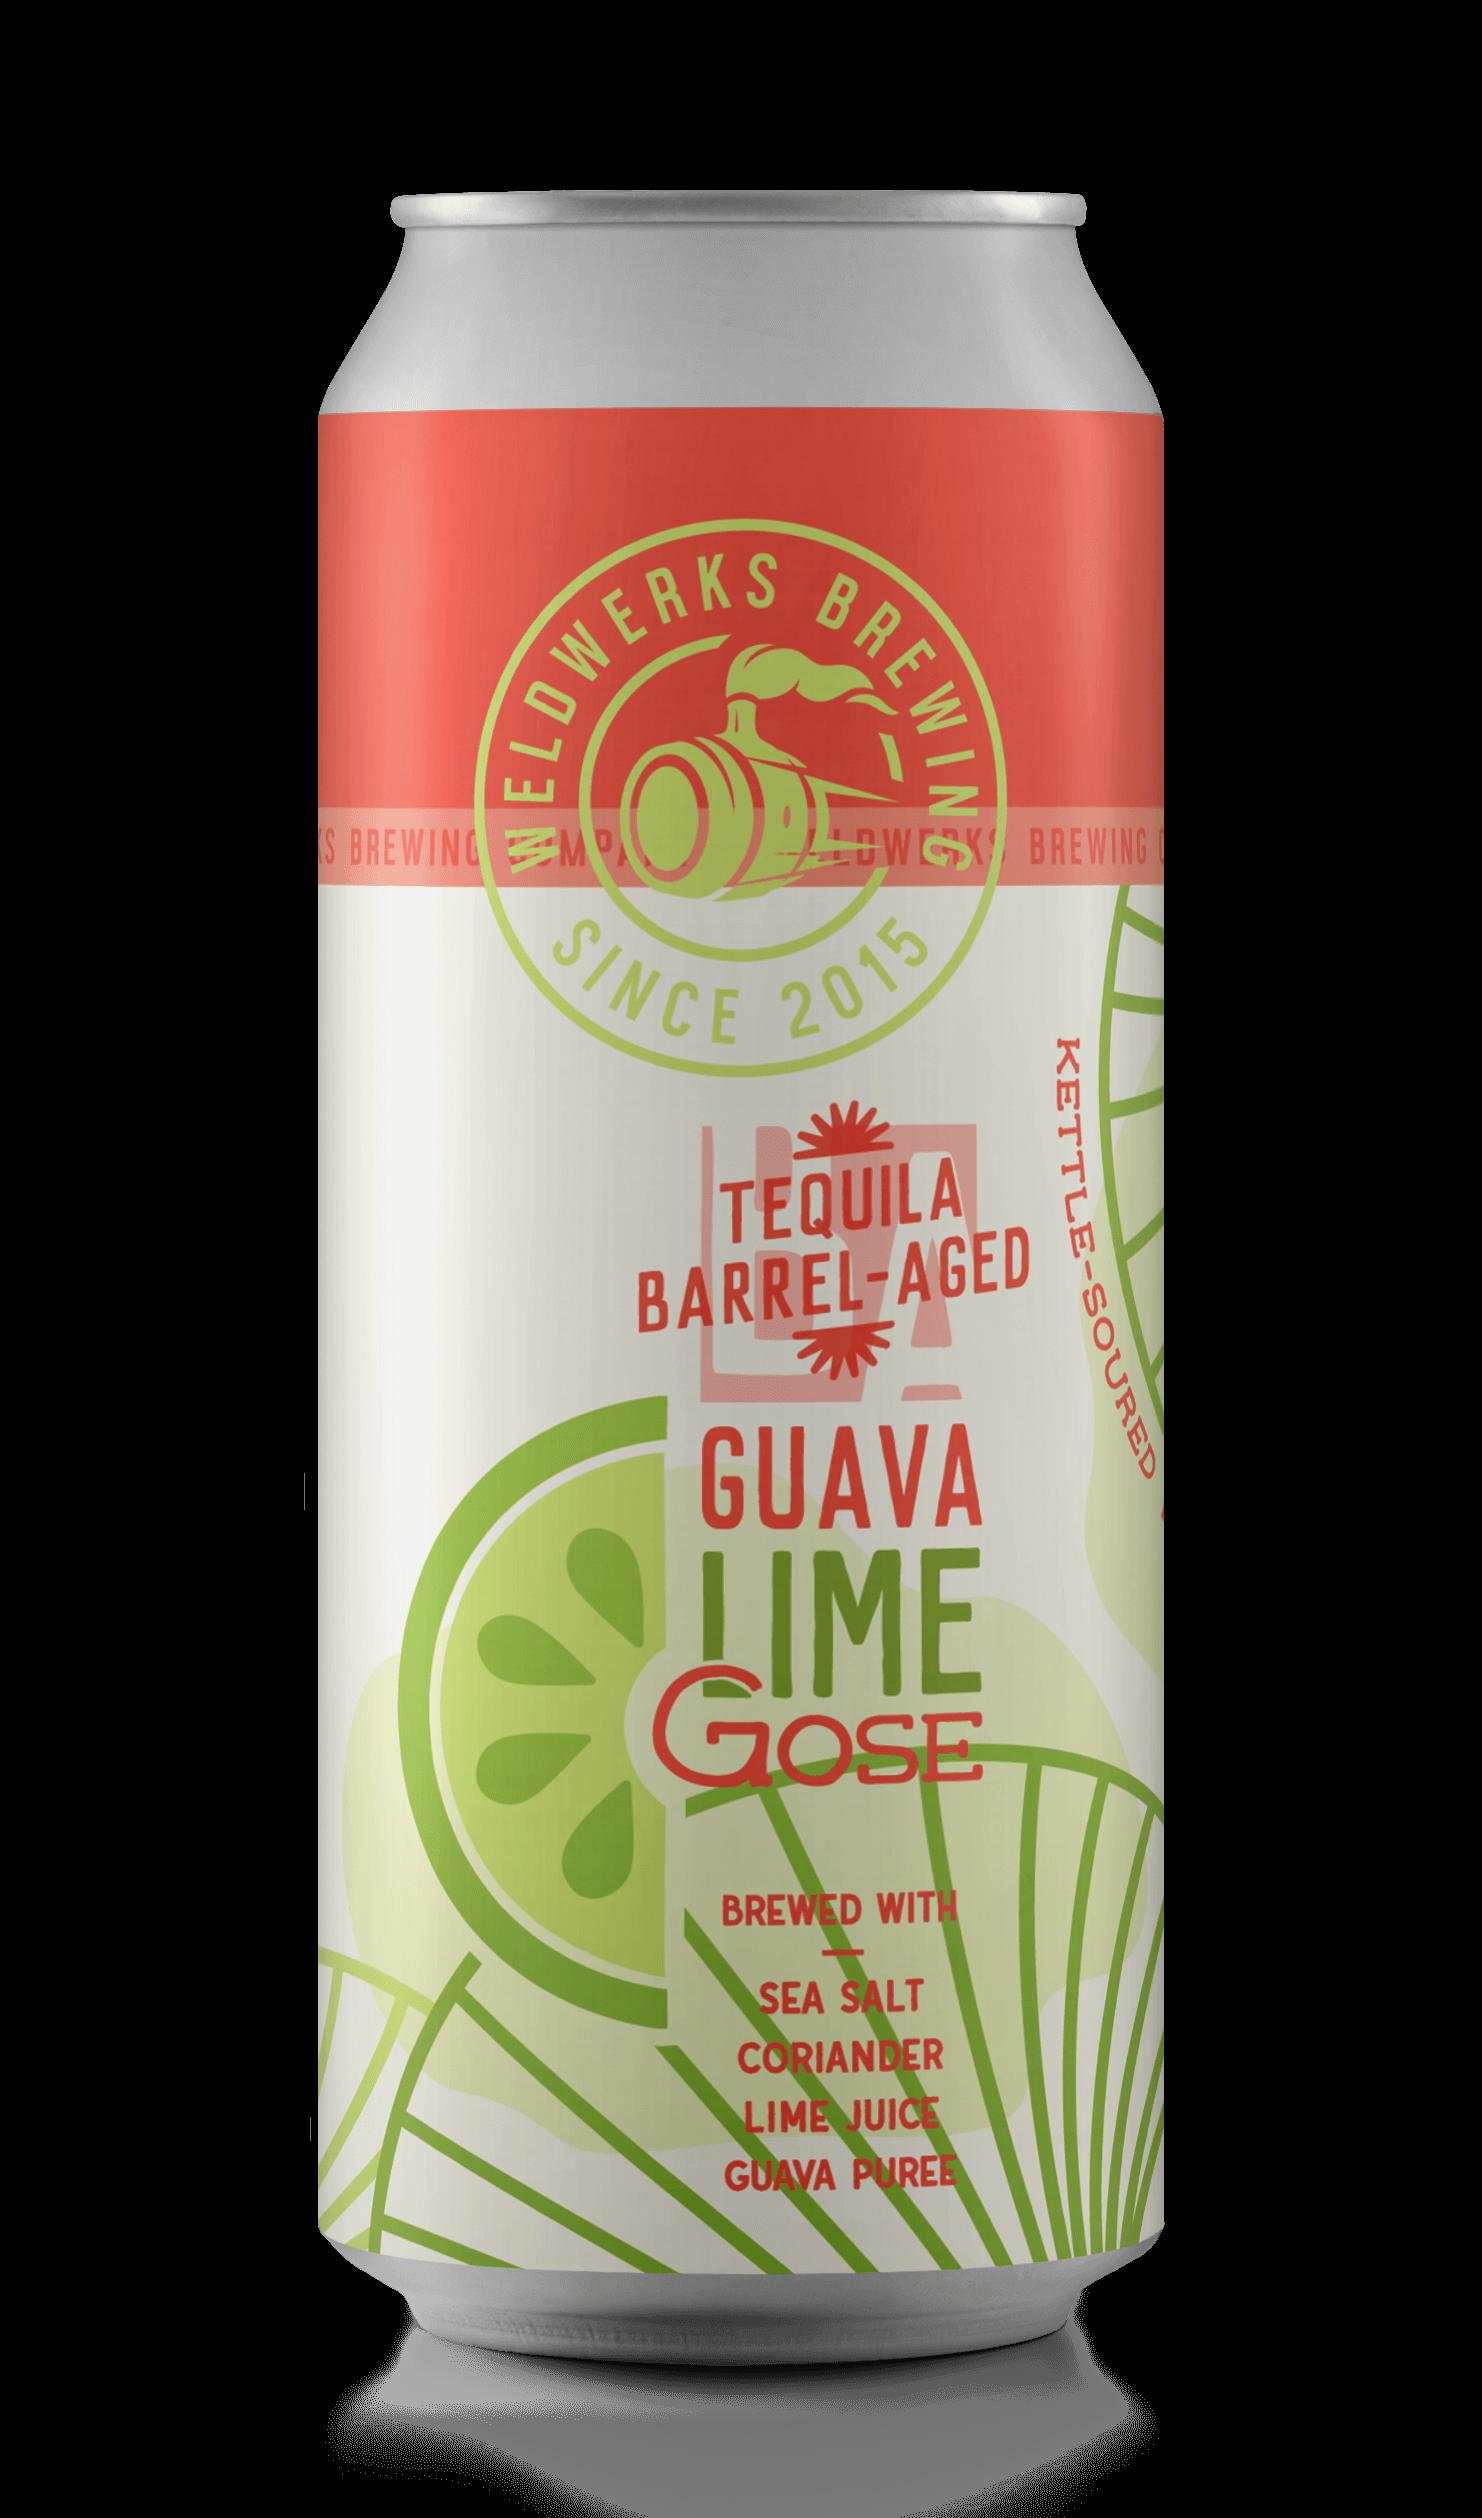 Tequlia Barrel-Aged Guava Lime Gose